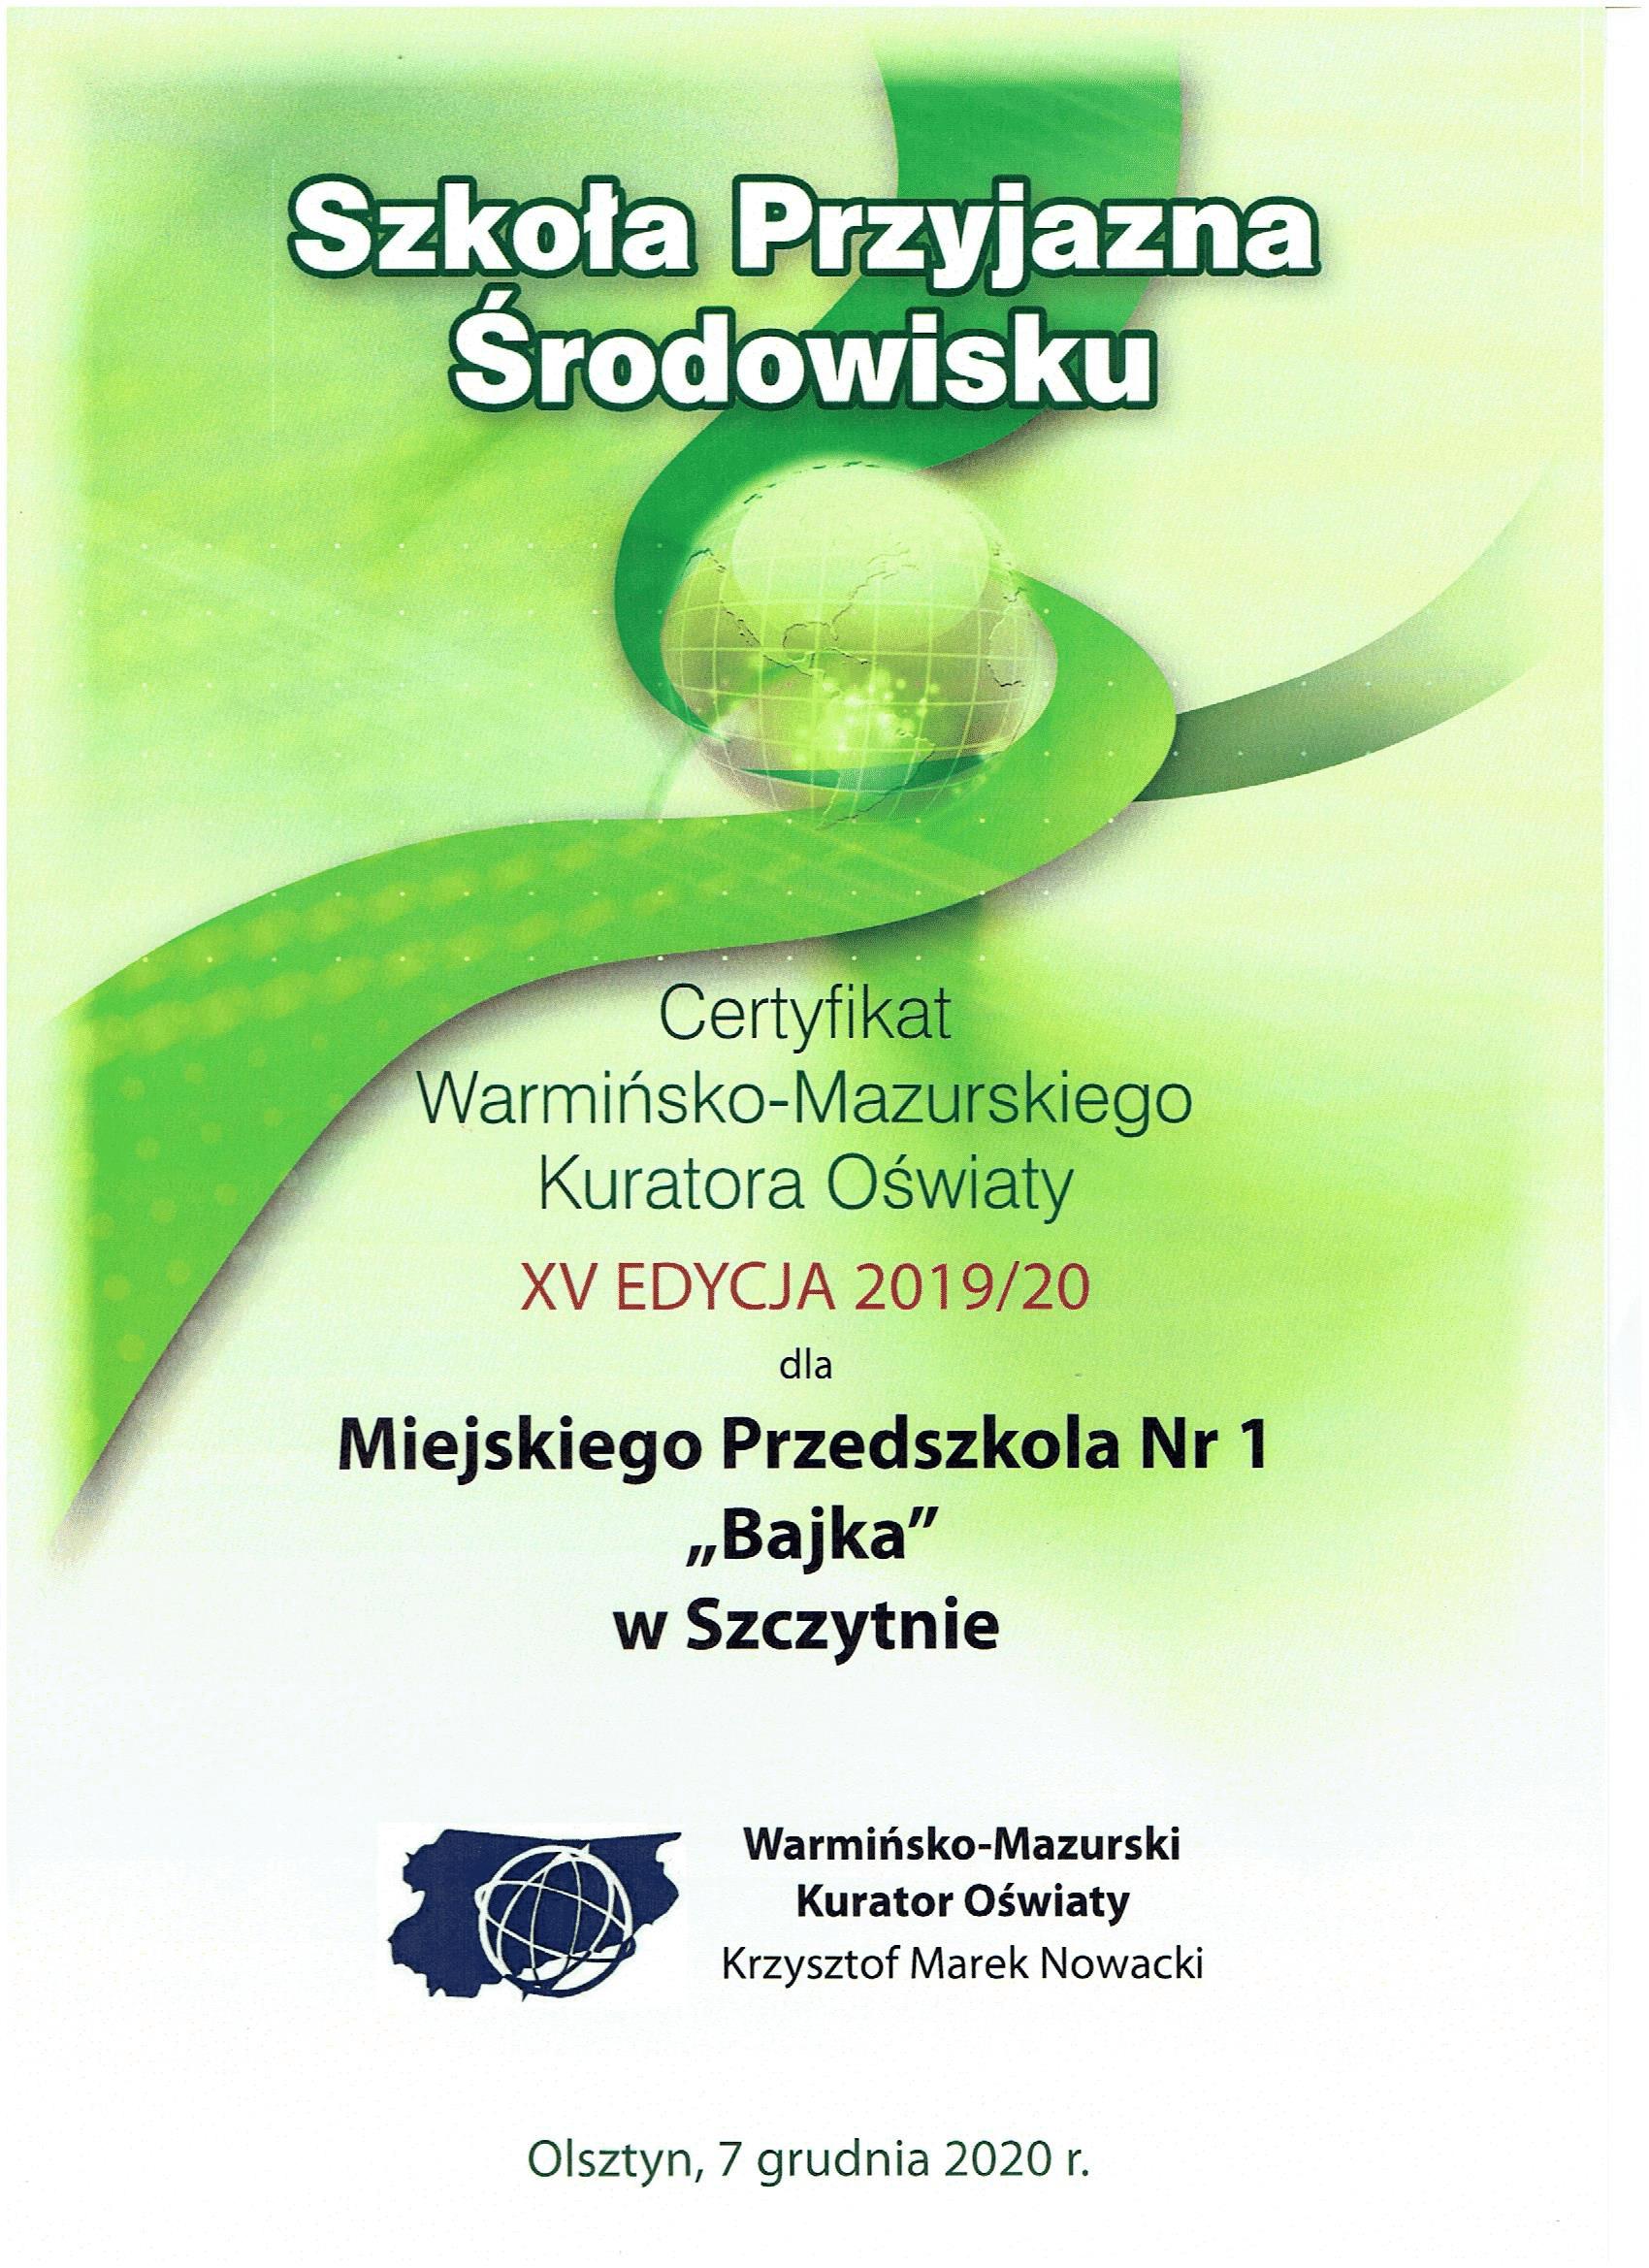 https://m.powiatszczycienski.pl/2020/12/orig/cert-1-36716.png